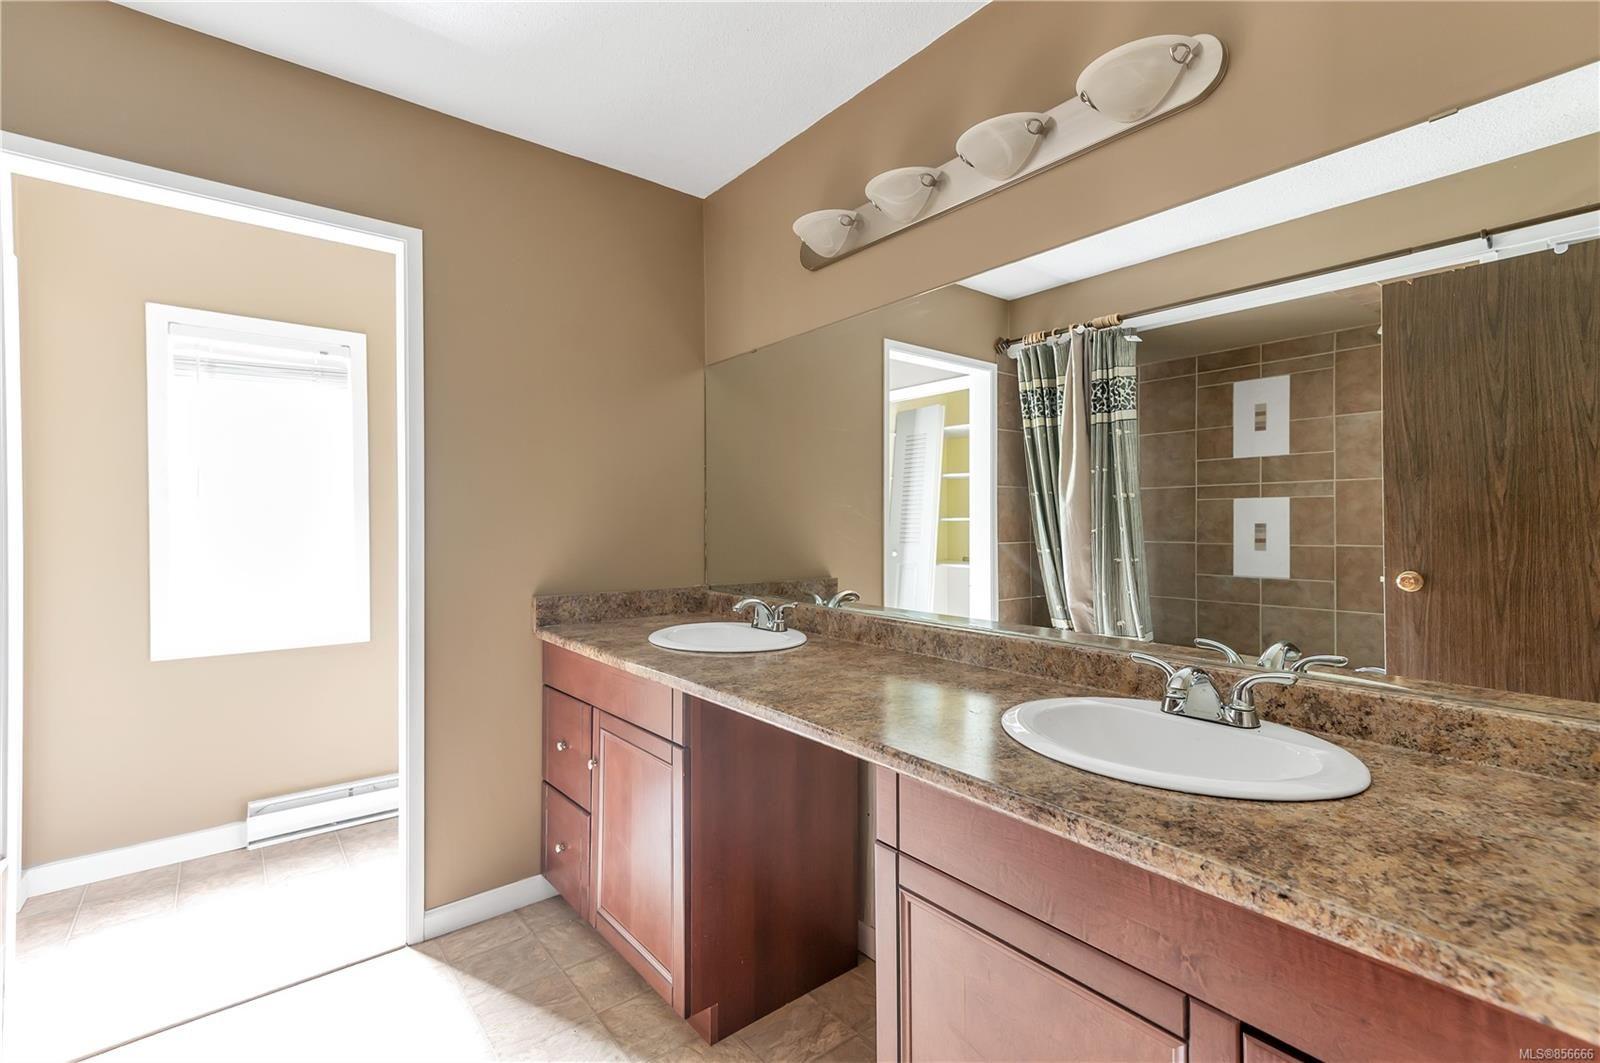 Photo 30: Photos: 2468 Oakes Rd in : CV Merville Black Creek House for sale (Comox Valley)  : MLS®# 856666